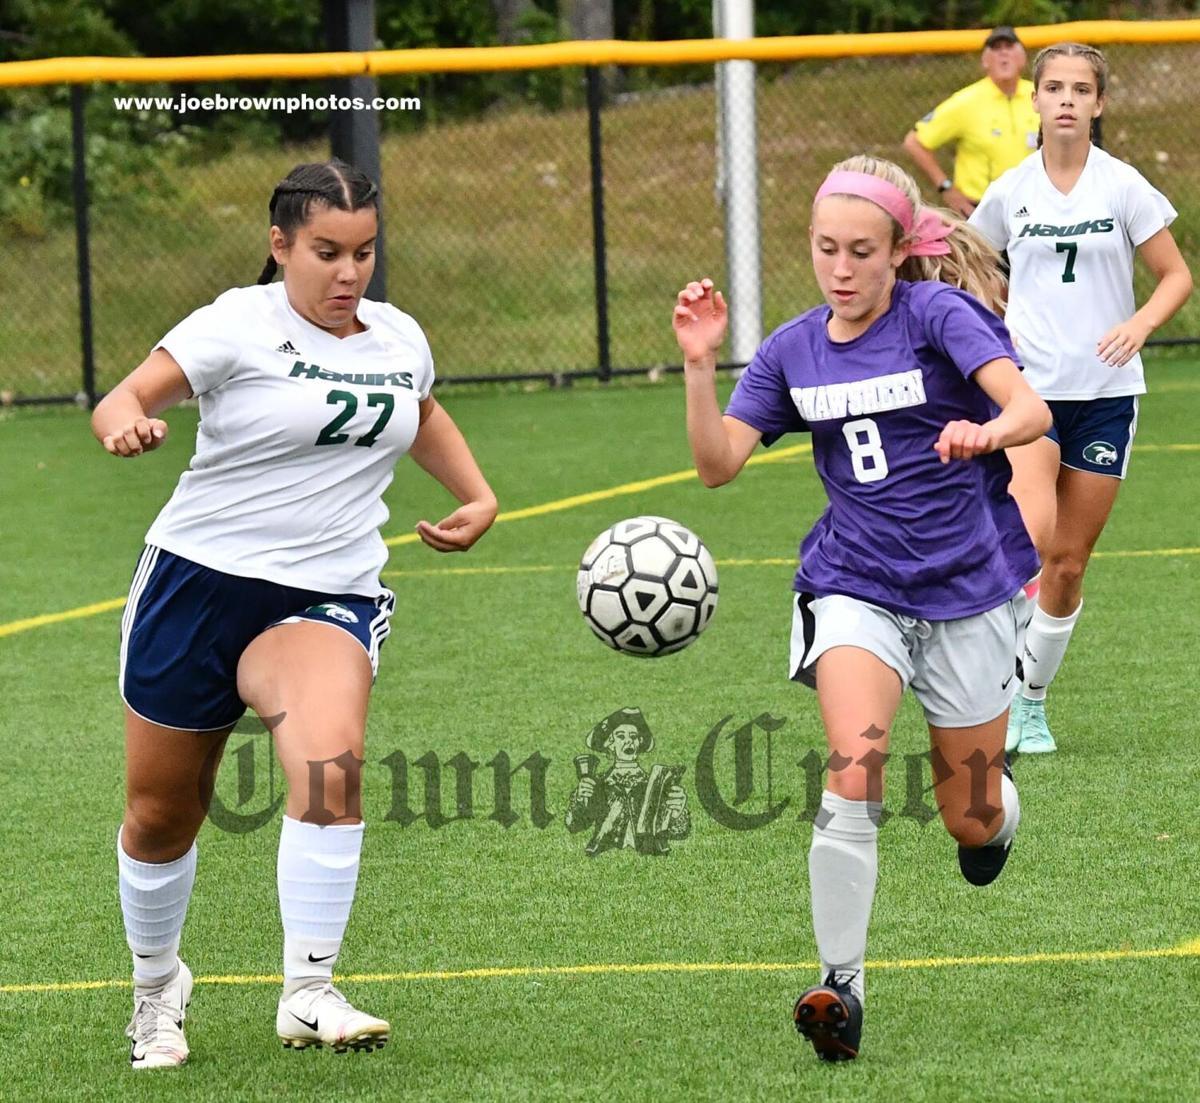 Essex Tech's Lacey Gonzalez and Shawsheen Tech's Kendra Minghella pursue a loose ball